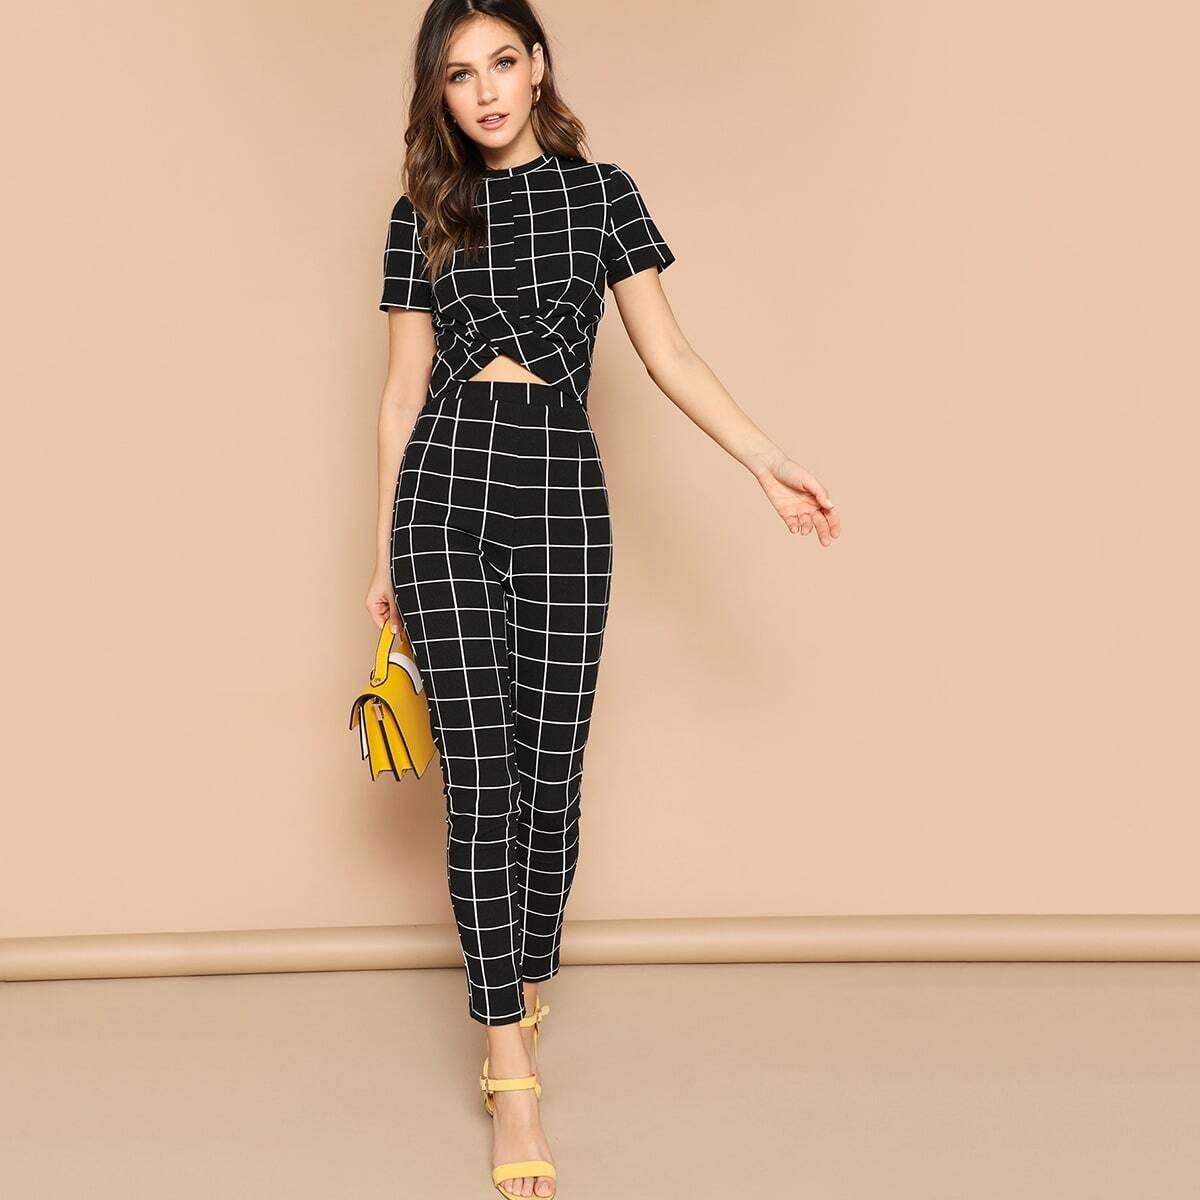 SHEIN coupon: Cross Wrap Front Grid Top & Pants Set